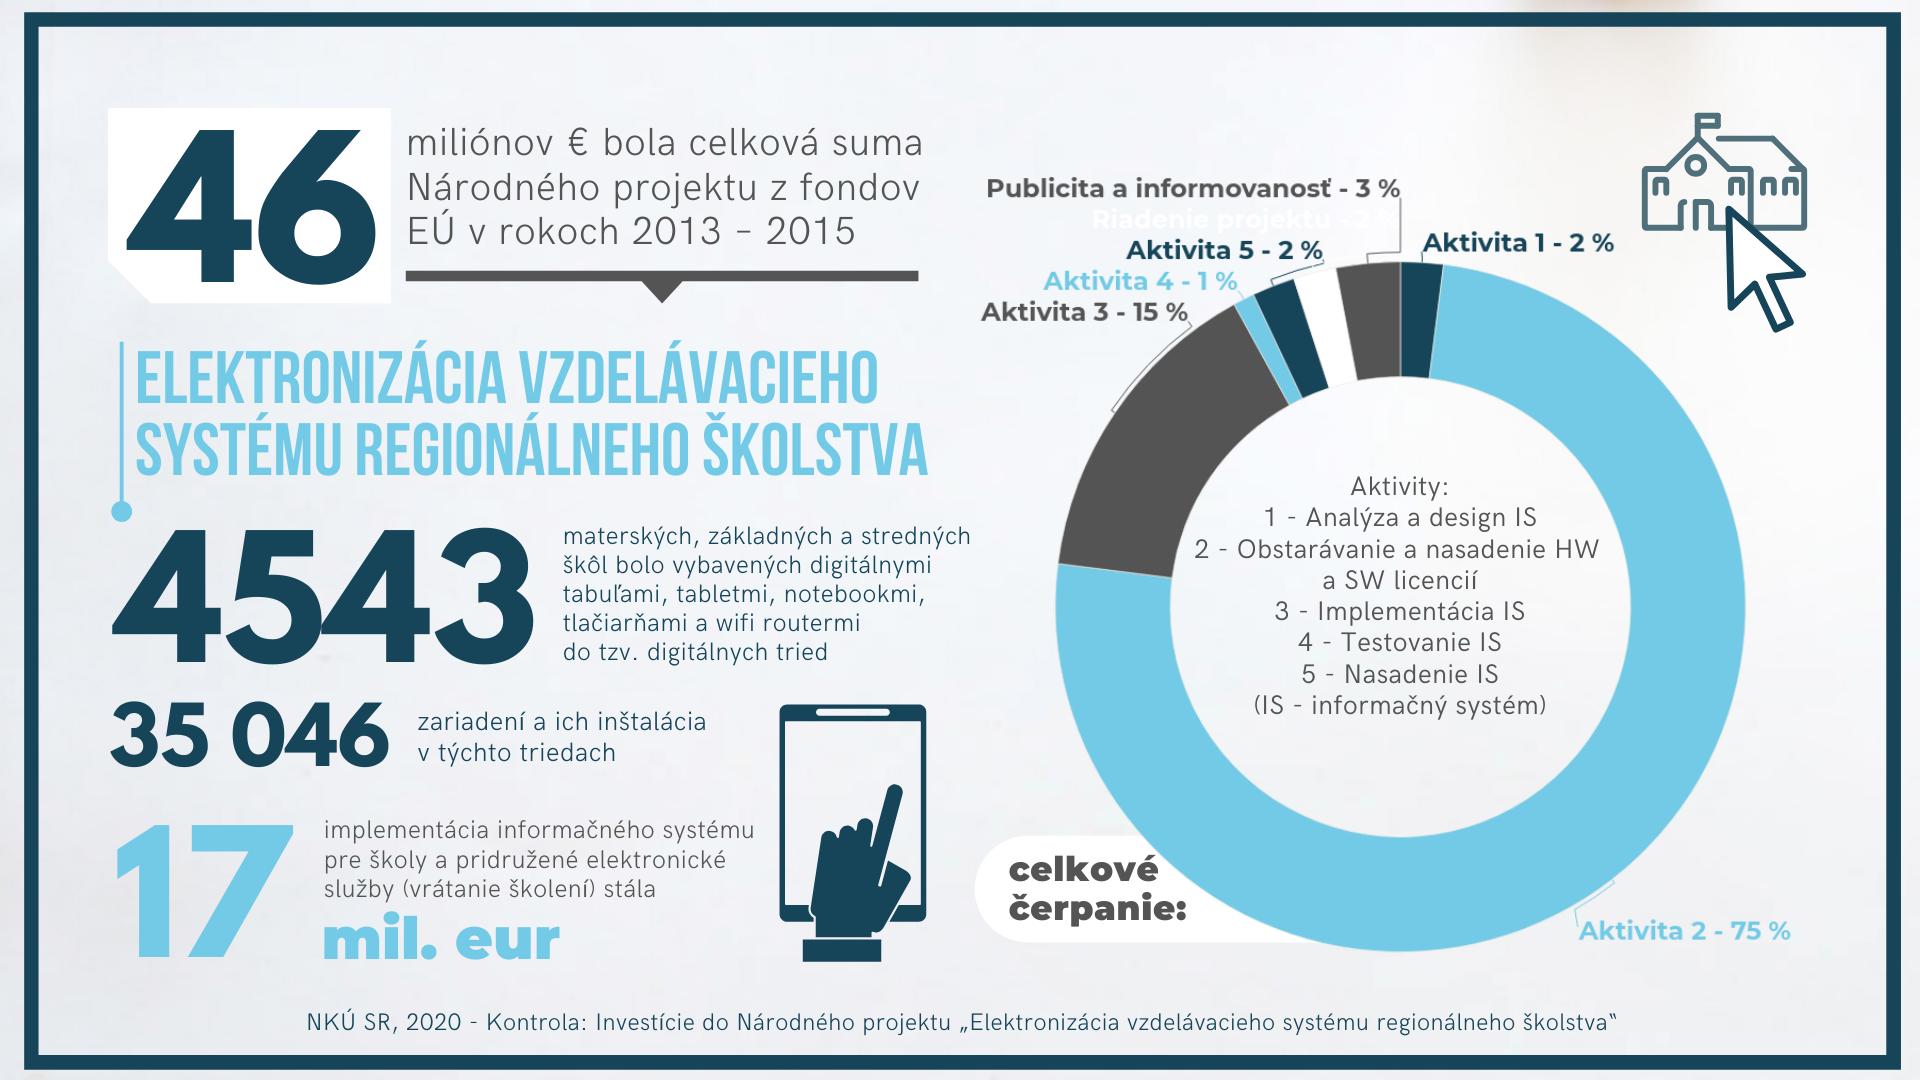 infografika - elektronizácia školstva